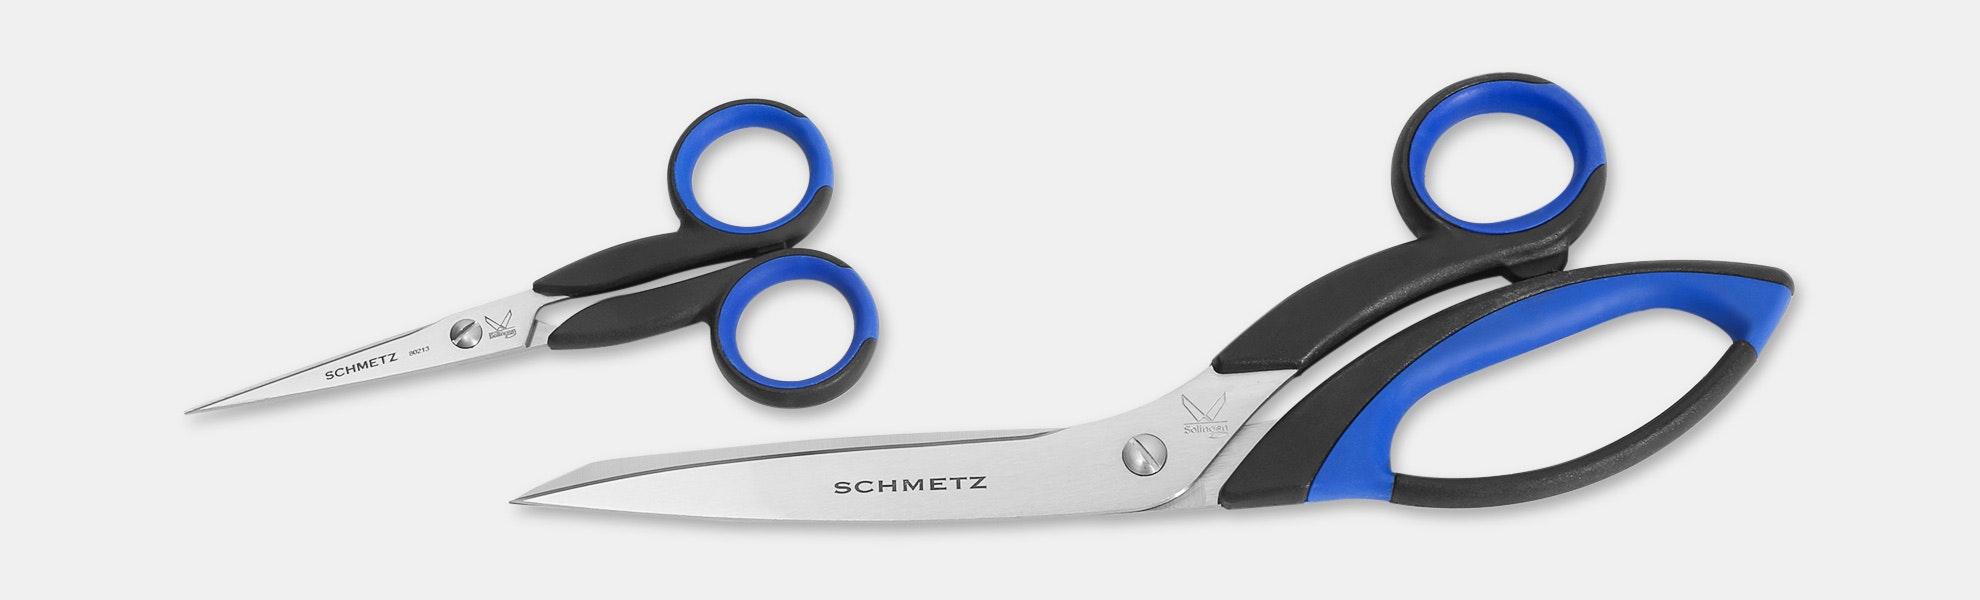 Schmetz Scissor Set